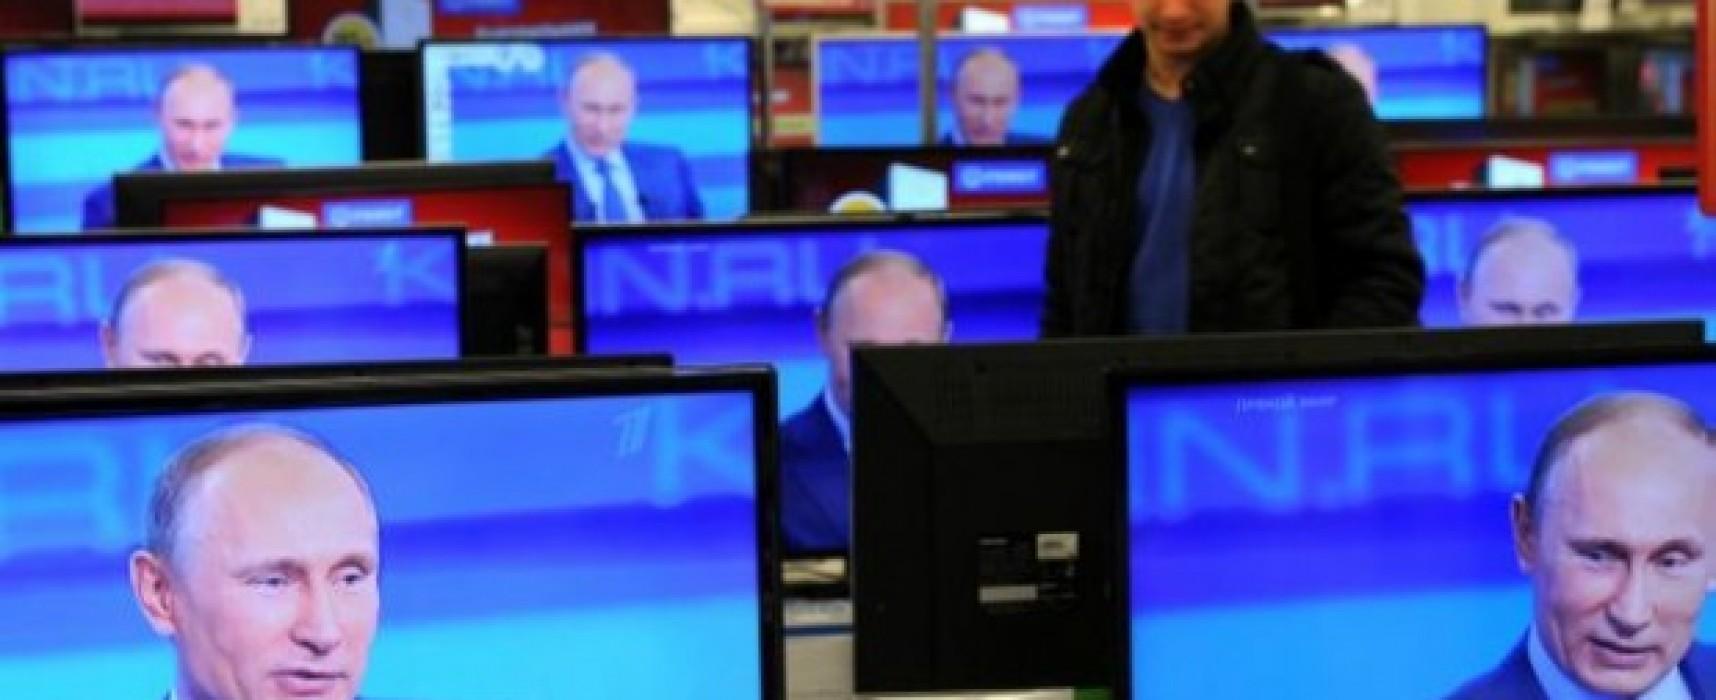 Putin is Operating a Counterfeit, Propoganda TV Station in Ukraine